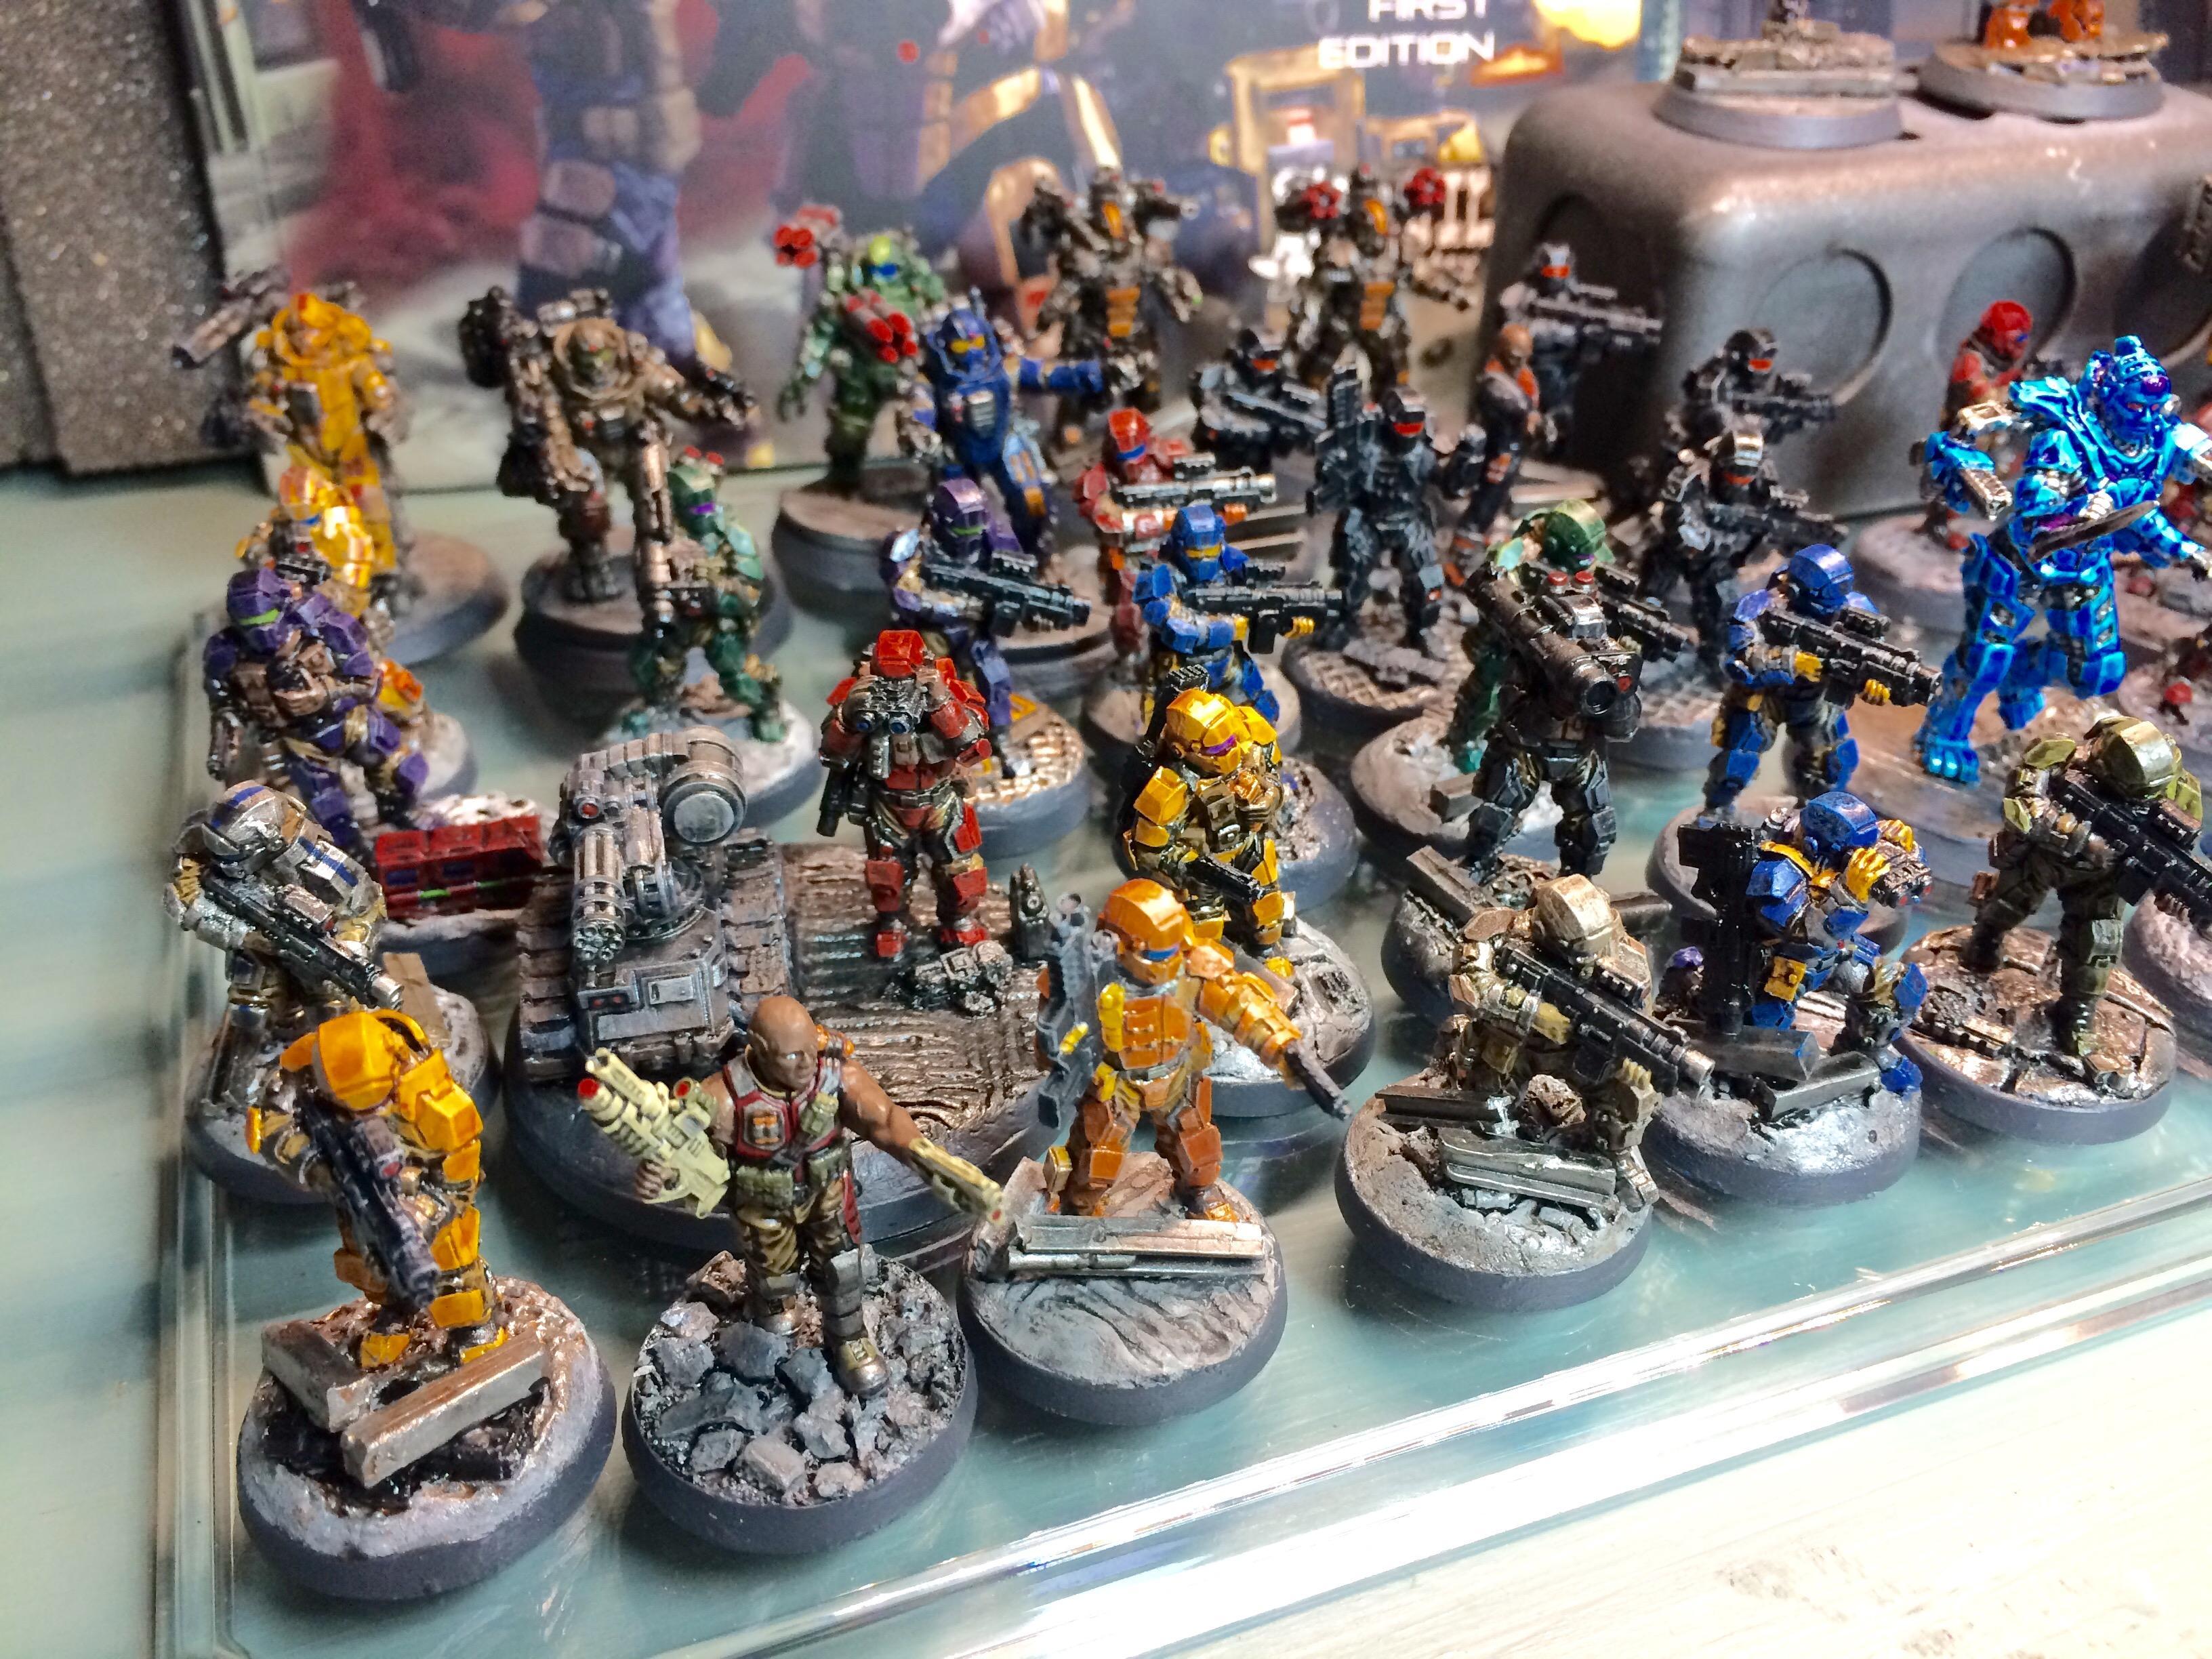 Afterlife, Anvil Industry, Ellion Hesp, Republic, Republic Grenadiers